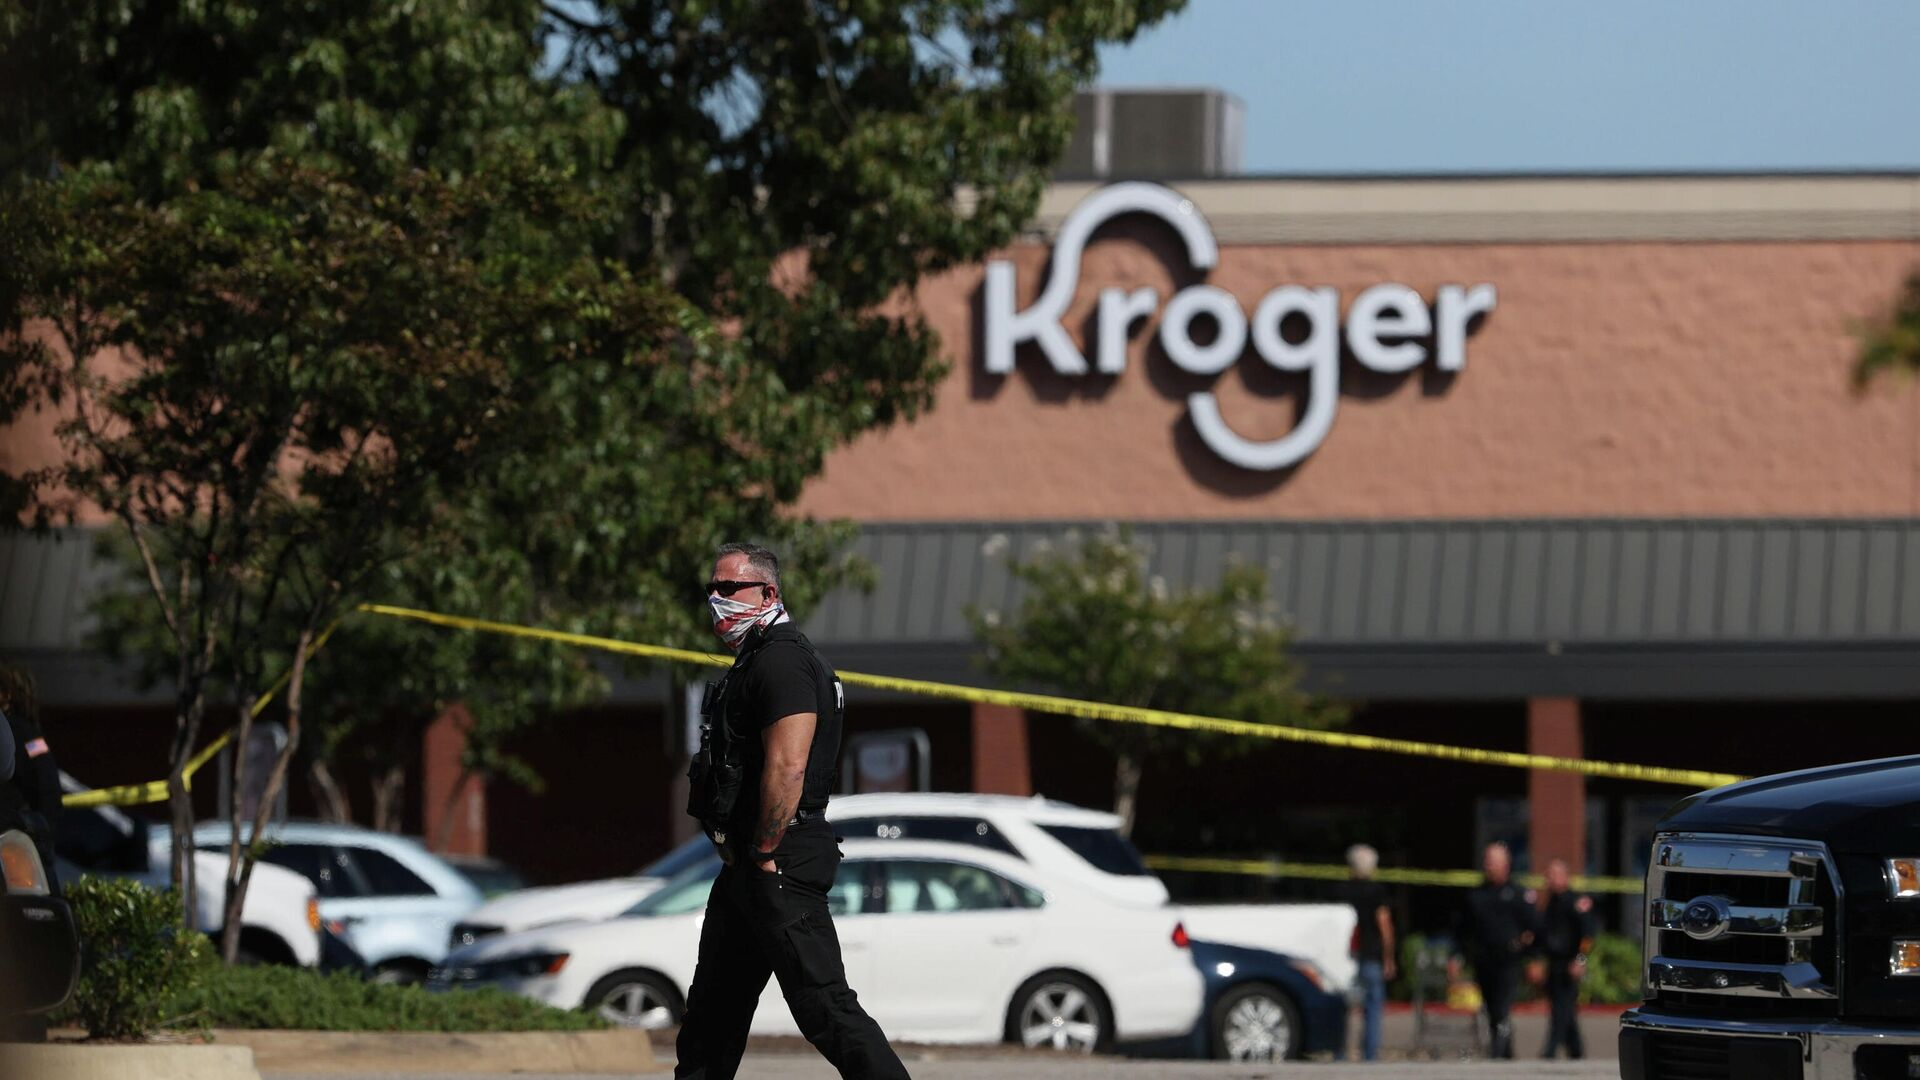 Emergency personnel respond to a shooting at a Kroger supermarket in suburban Memphis, Tennessee, U.S., September 23, 2021 - Sputnik International, 1920, 24.09.2021